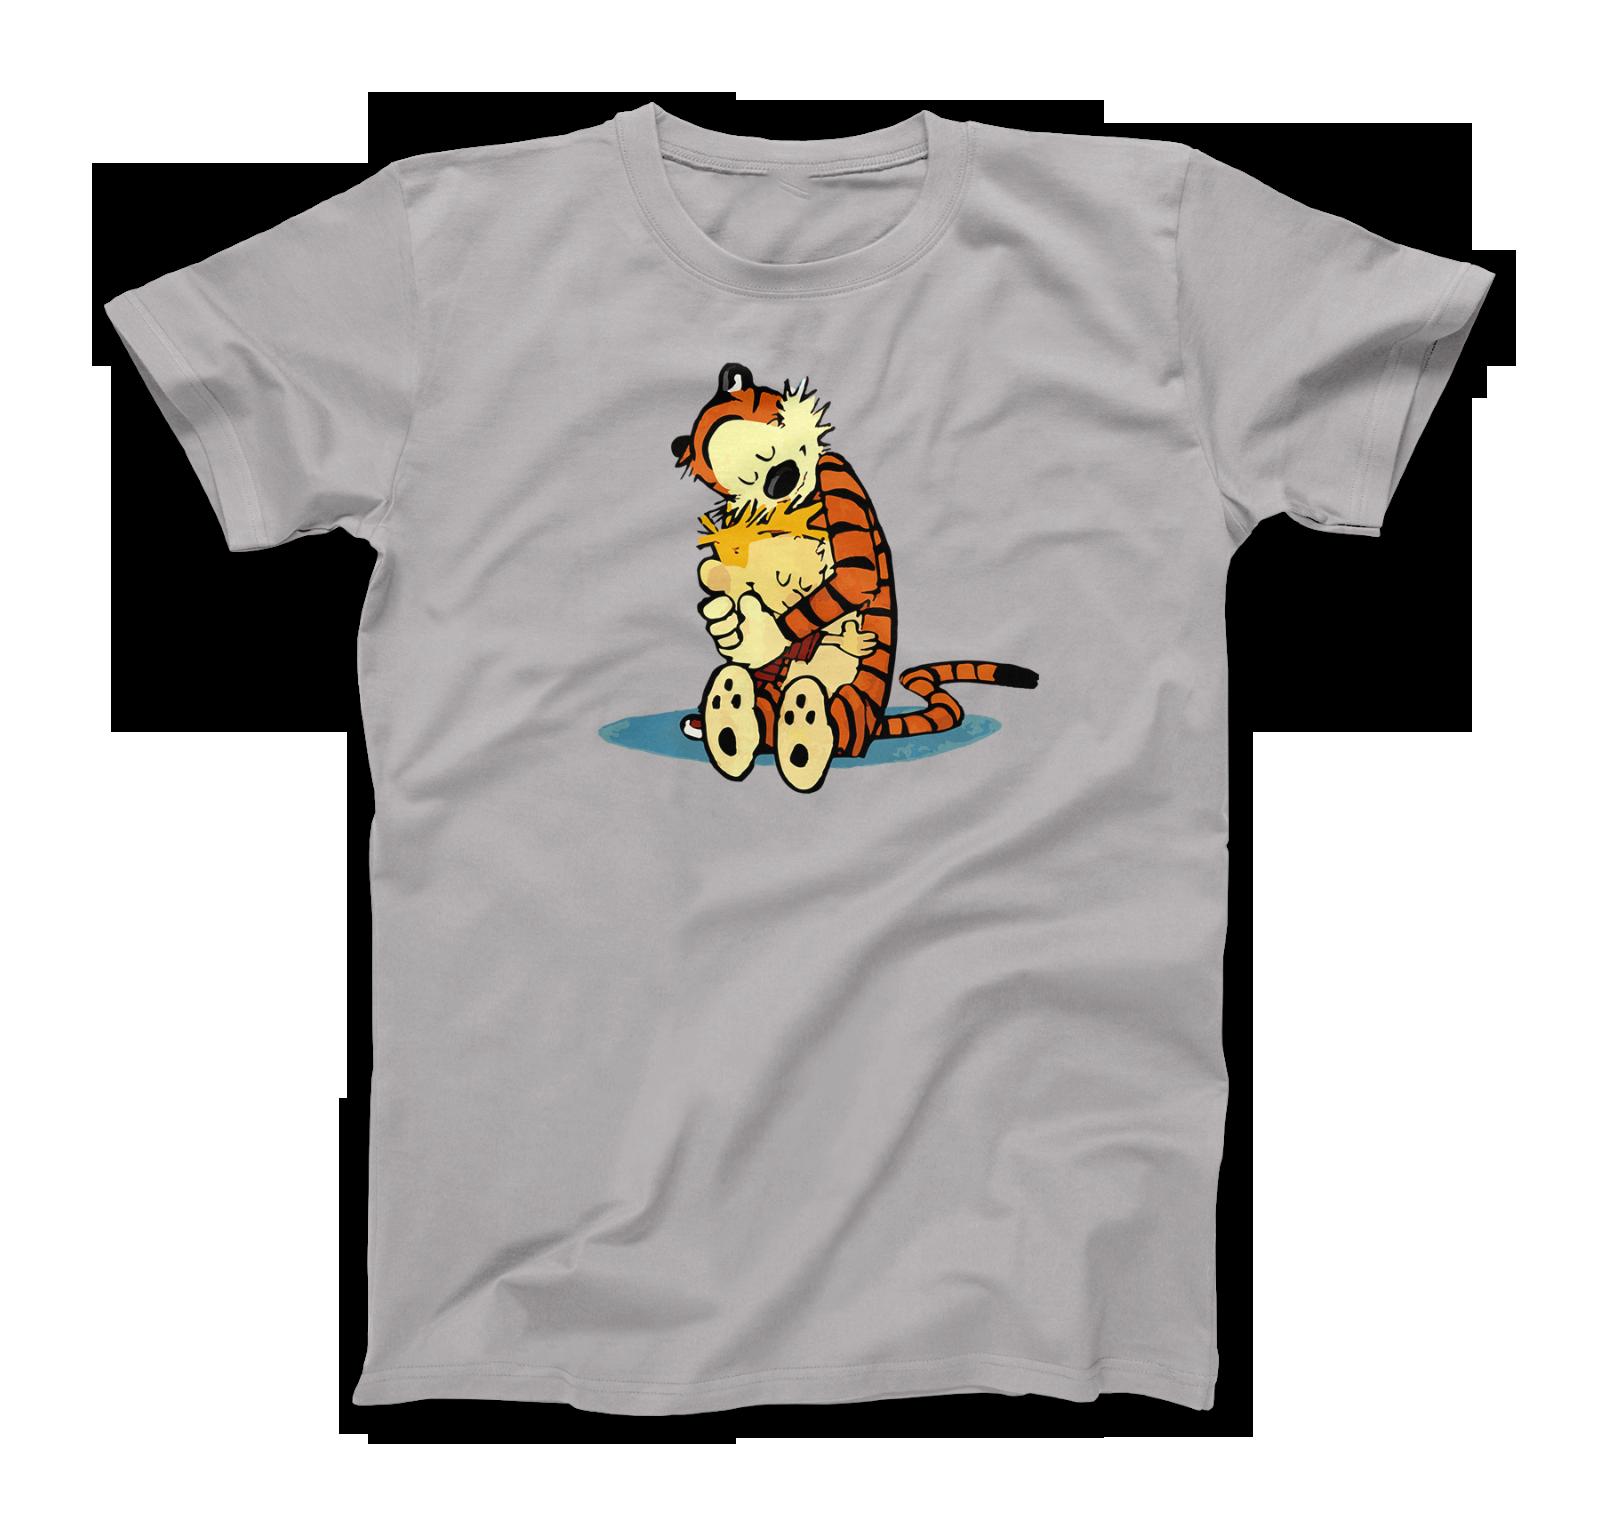 Calvin Hobbes Hugging T Shirt Men Women From The Cult And Classic Newspaper Comics All Size Tee Shirt